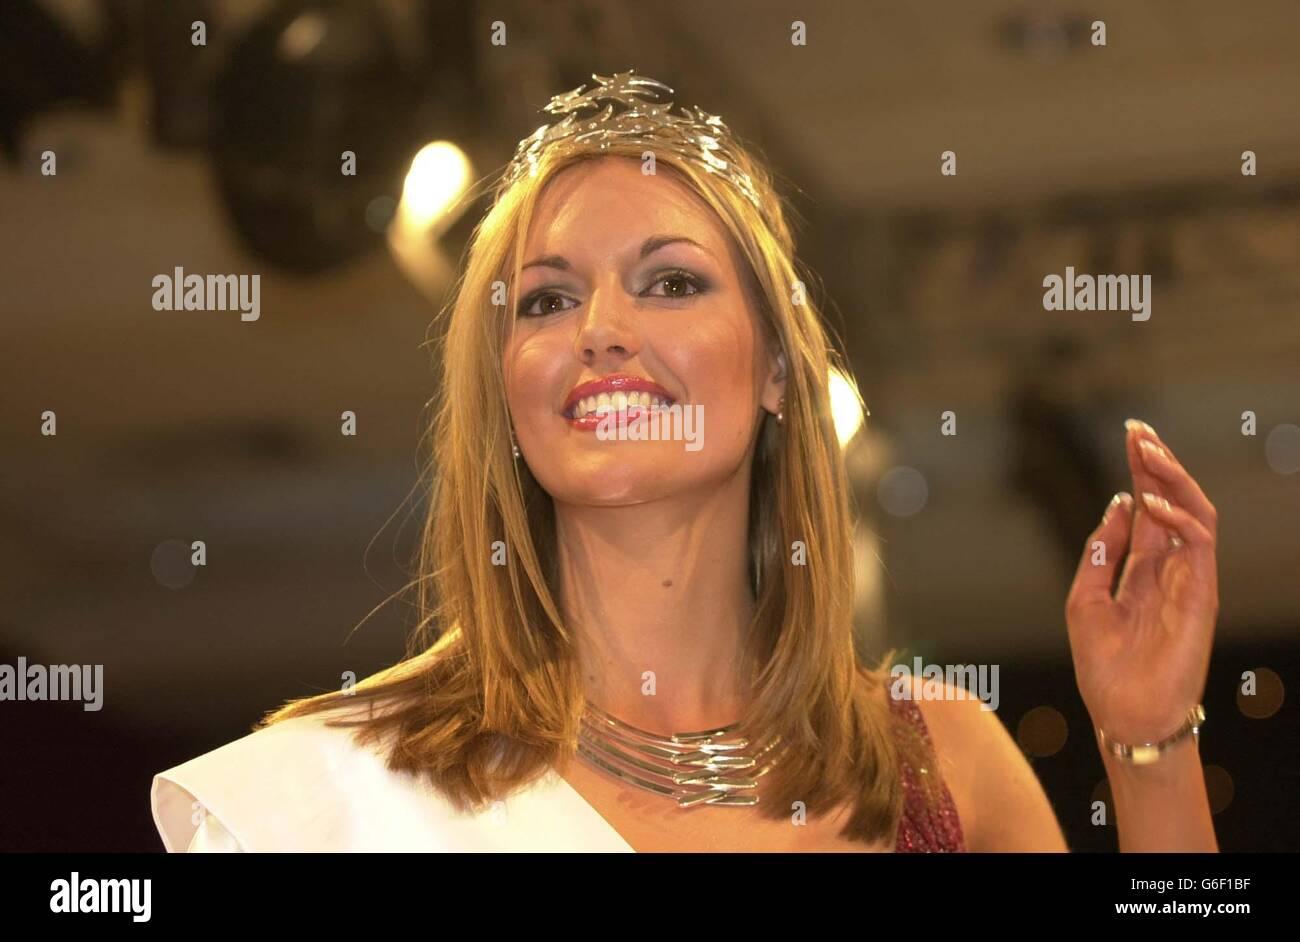 Miss ireland rosanna davison stock photo 107280531 alamy miss ireland rosanna davison altavistaventures Choice Image